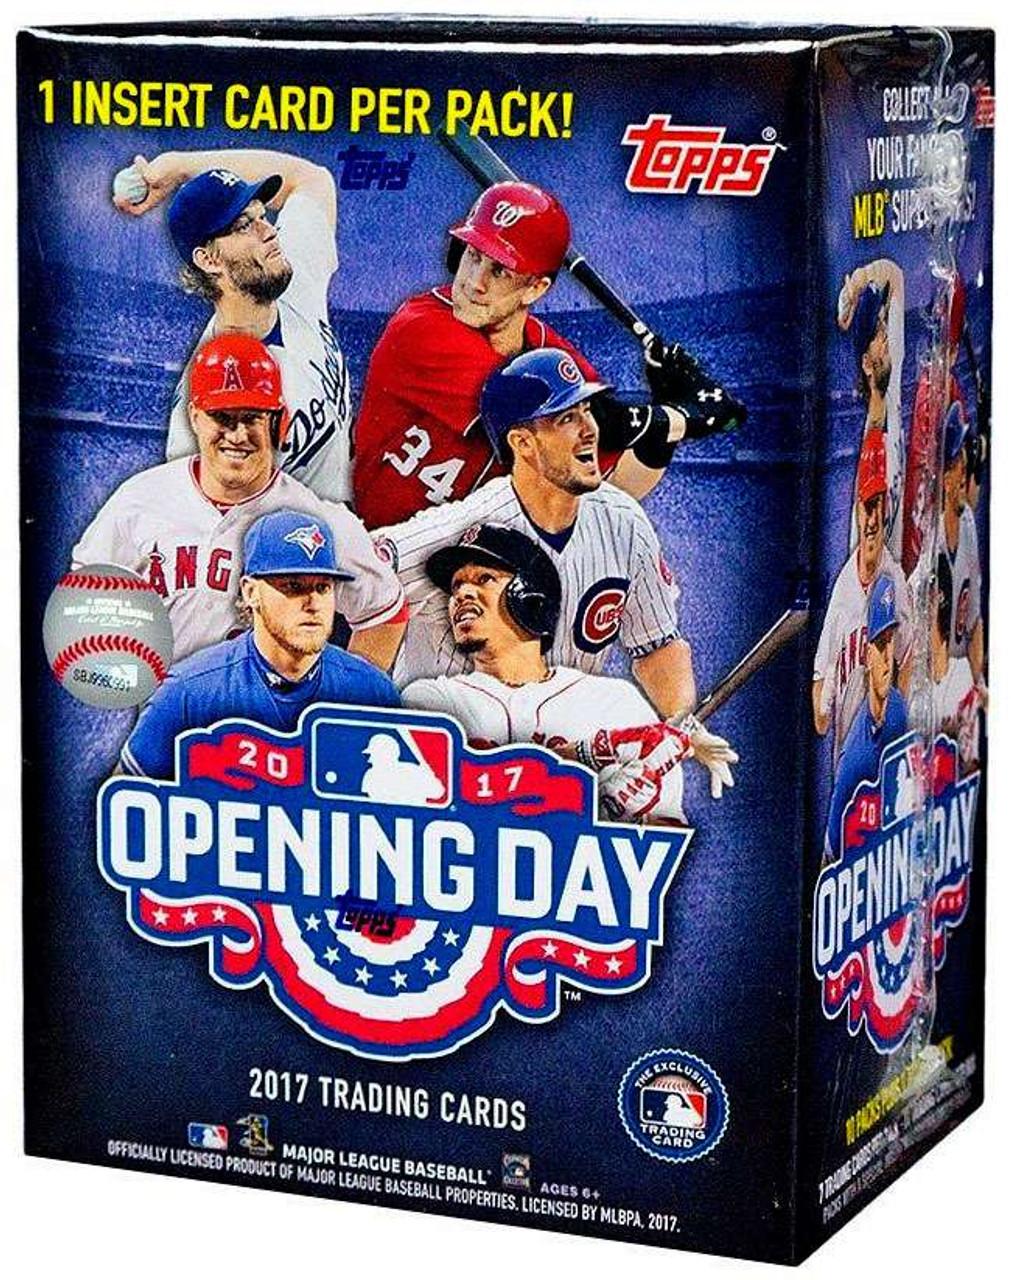 Mlb 2017 Topps Baseball Cards 2017 Opening Day Trading Card Blaster Box 11 Packs